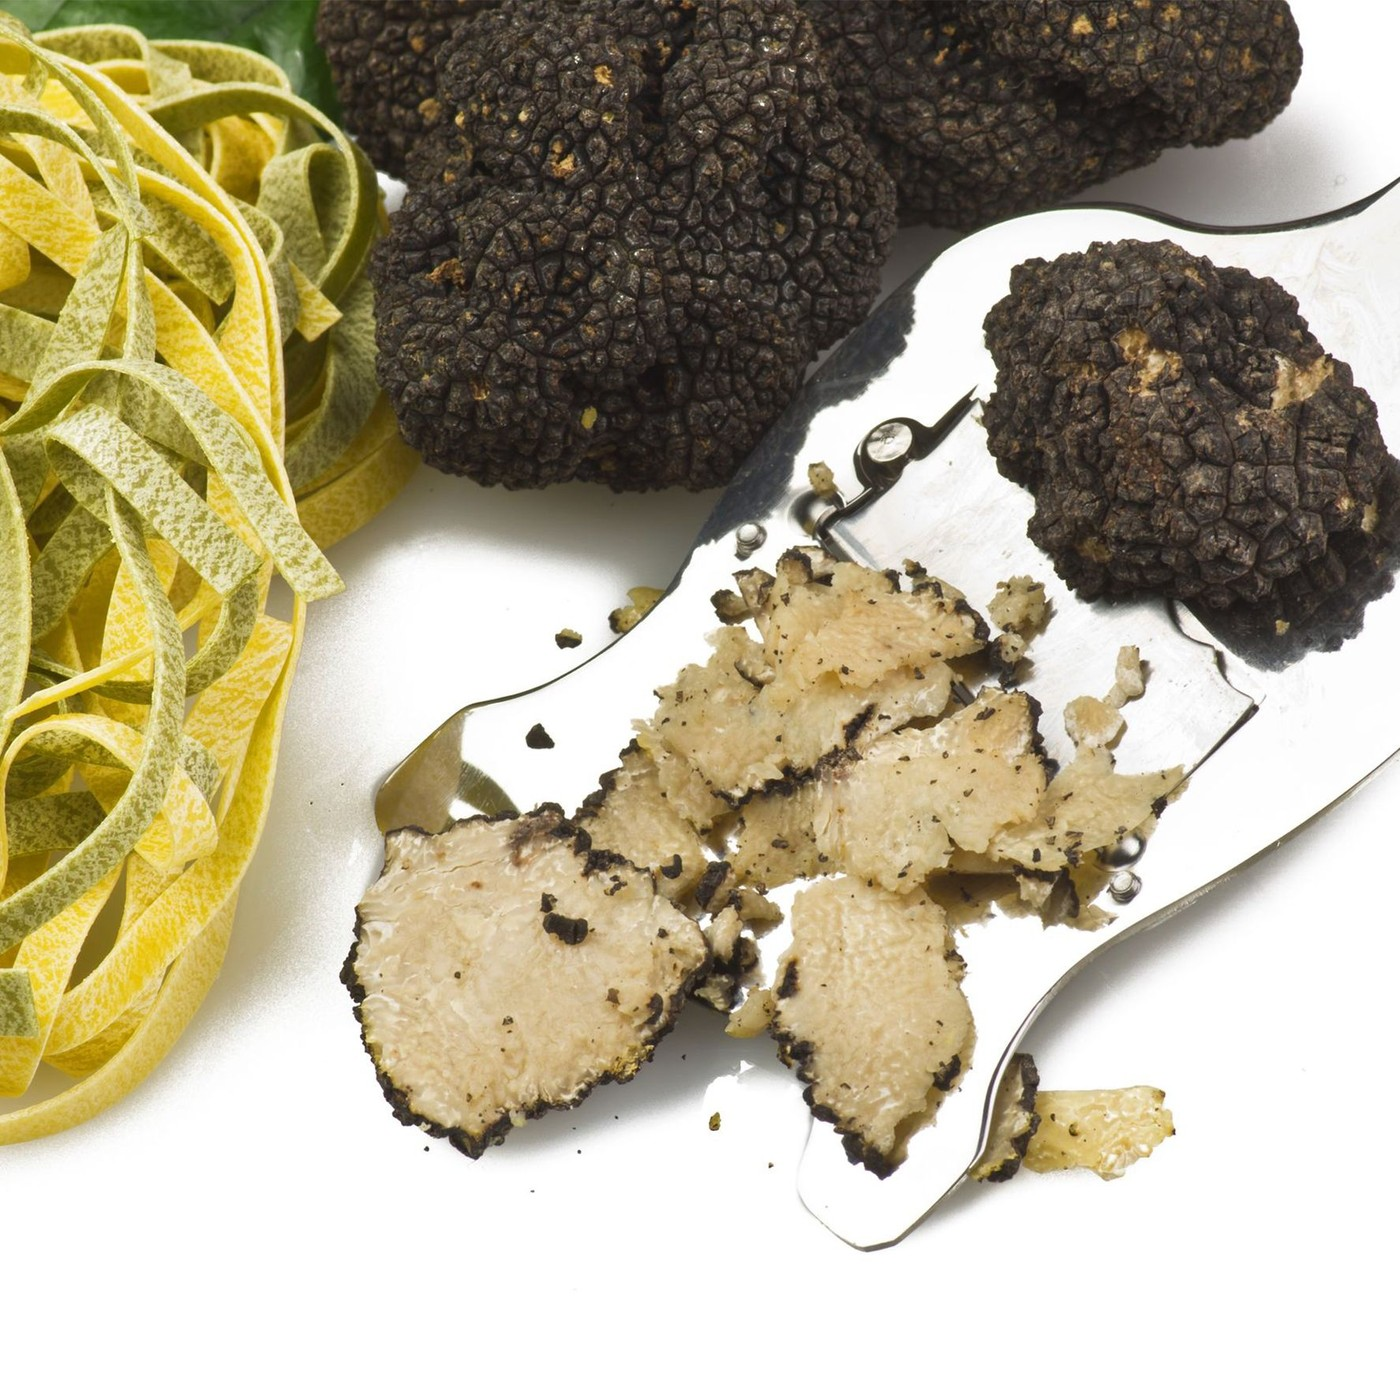 receta de Tartufo Nero Uncinatum Seconda Scelta (Calibre Menor A 15g)